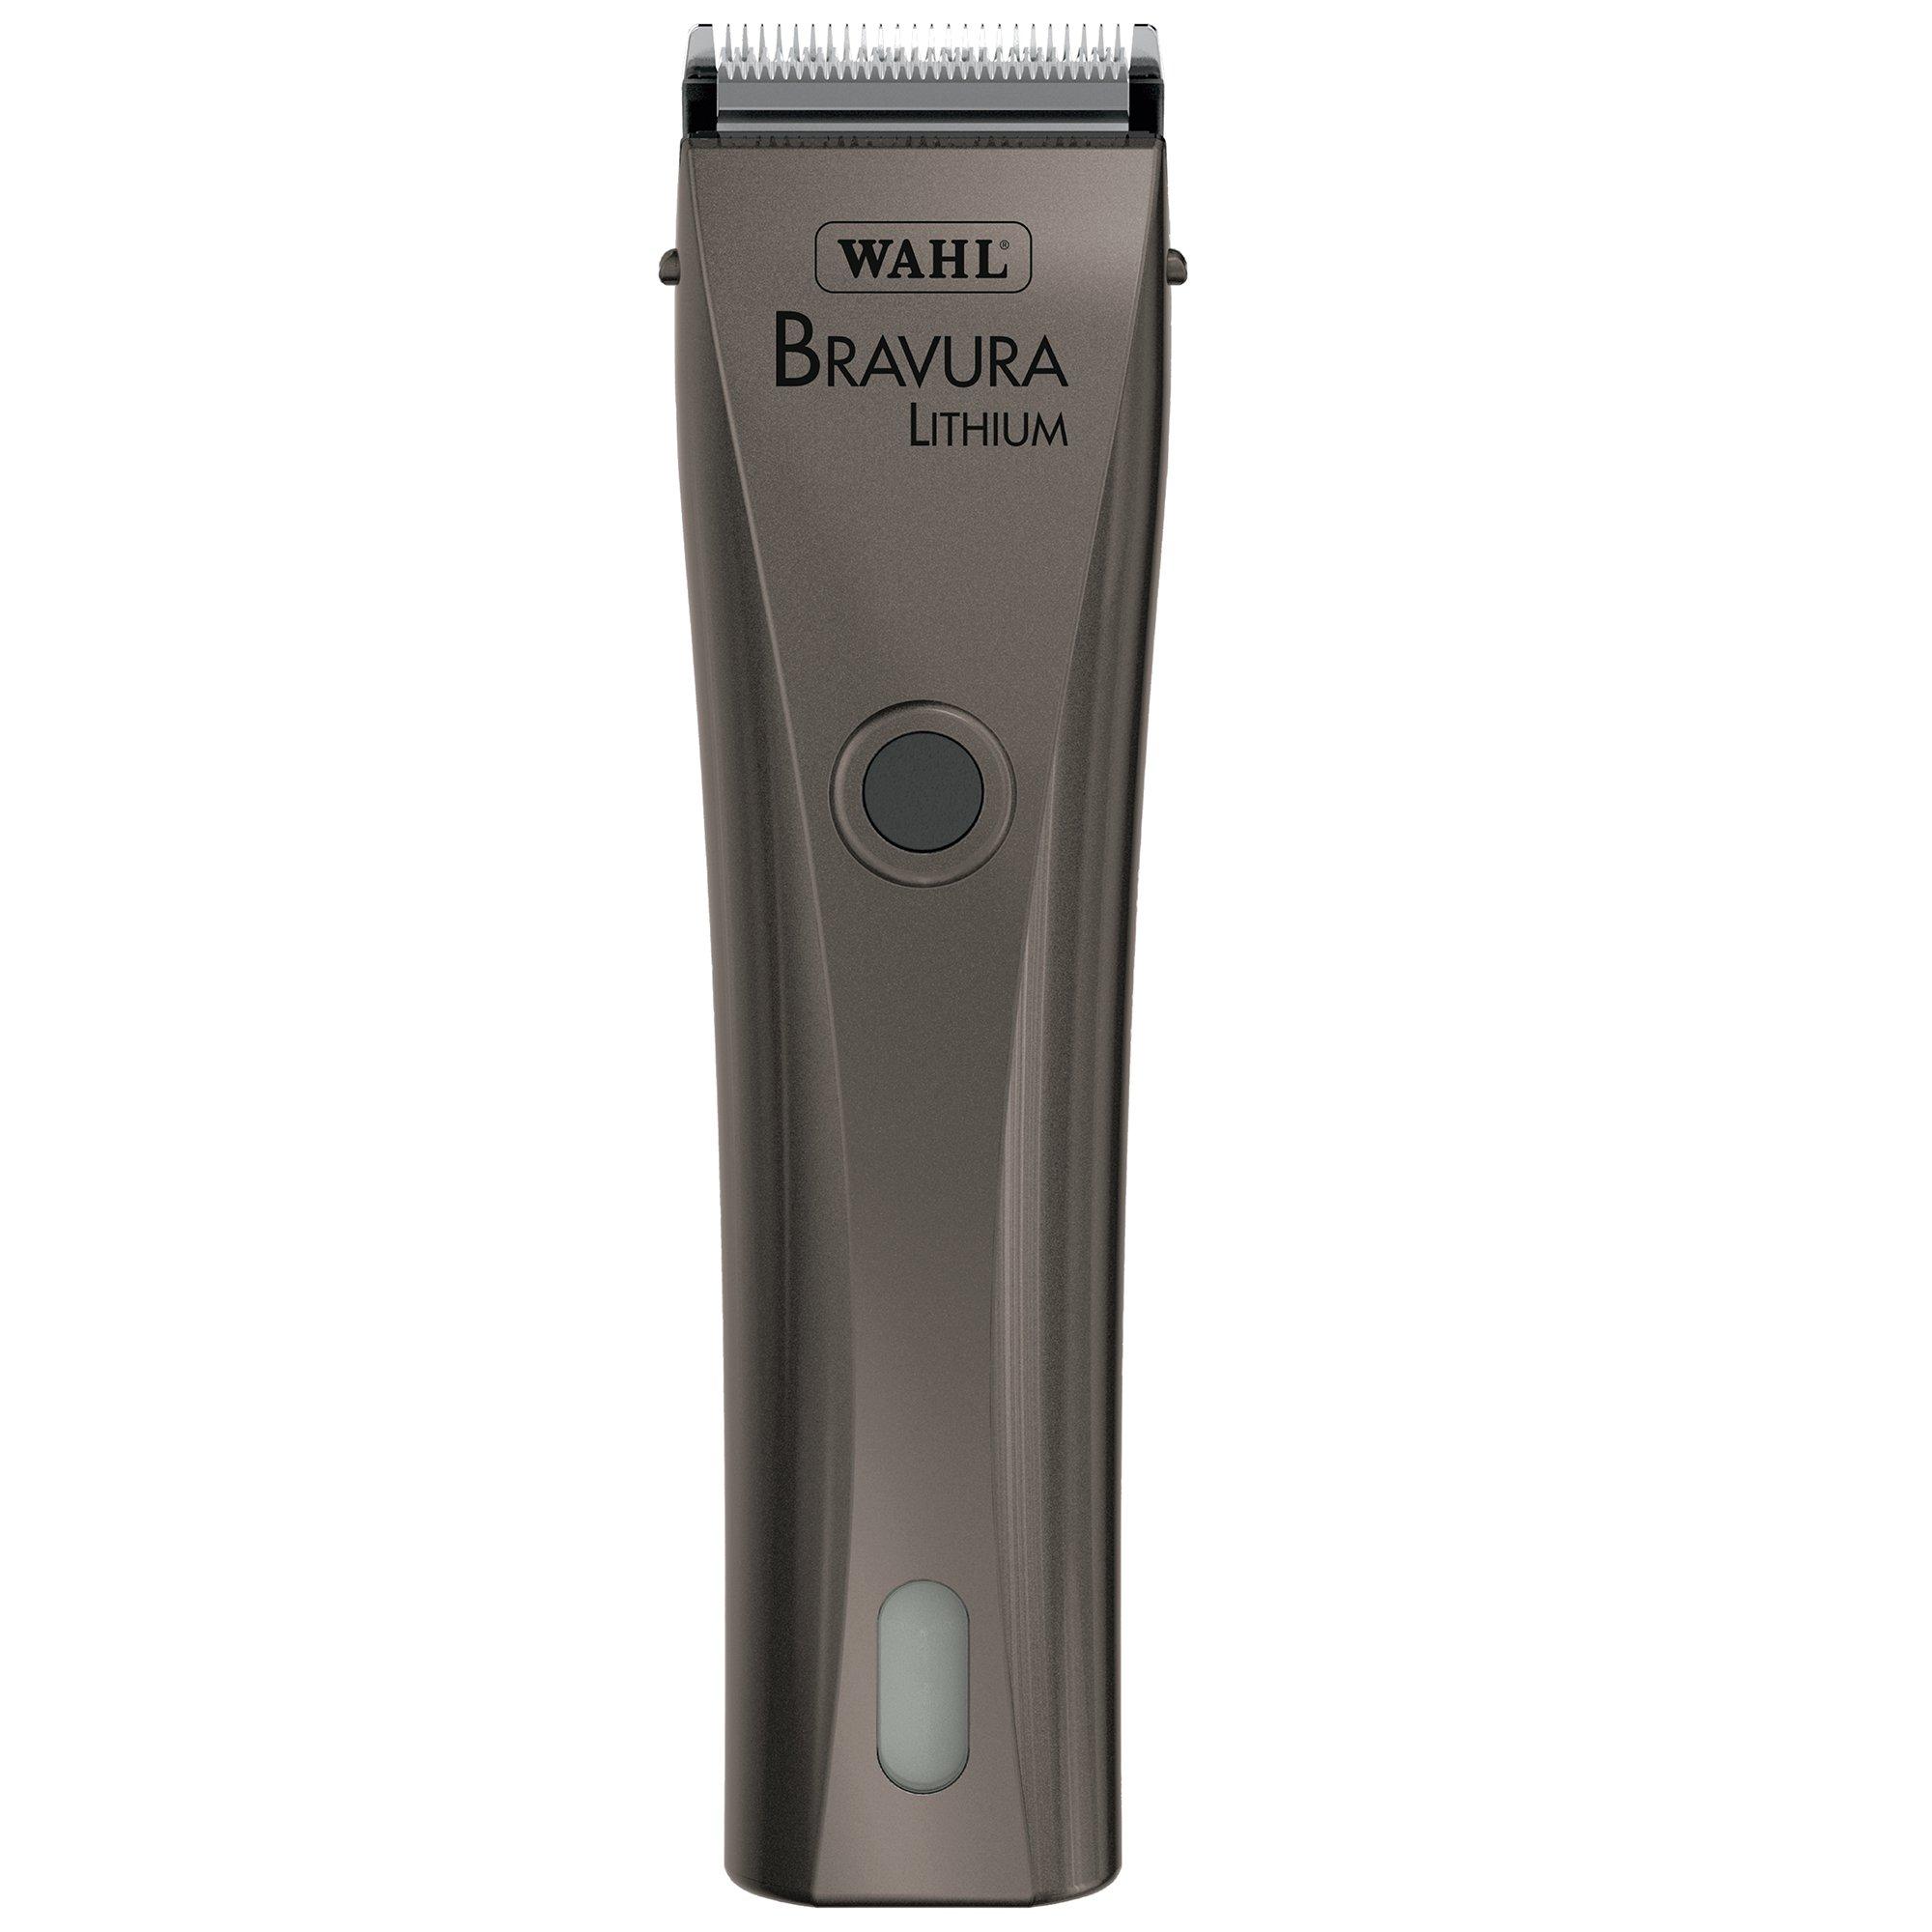 Wahl Professional Animal Bravura Lithium Gunmetal Clipper #41870-0425